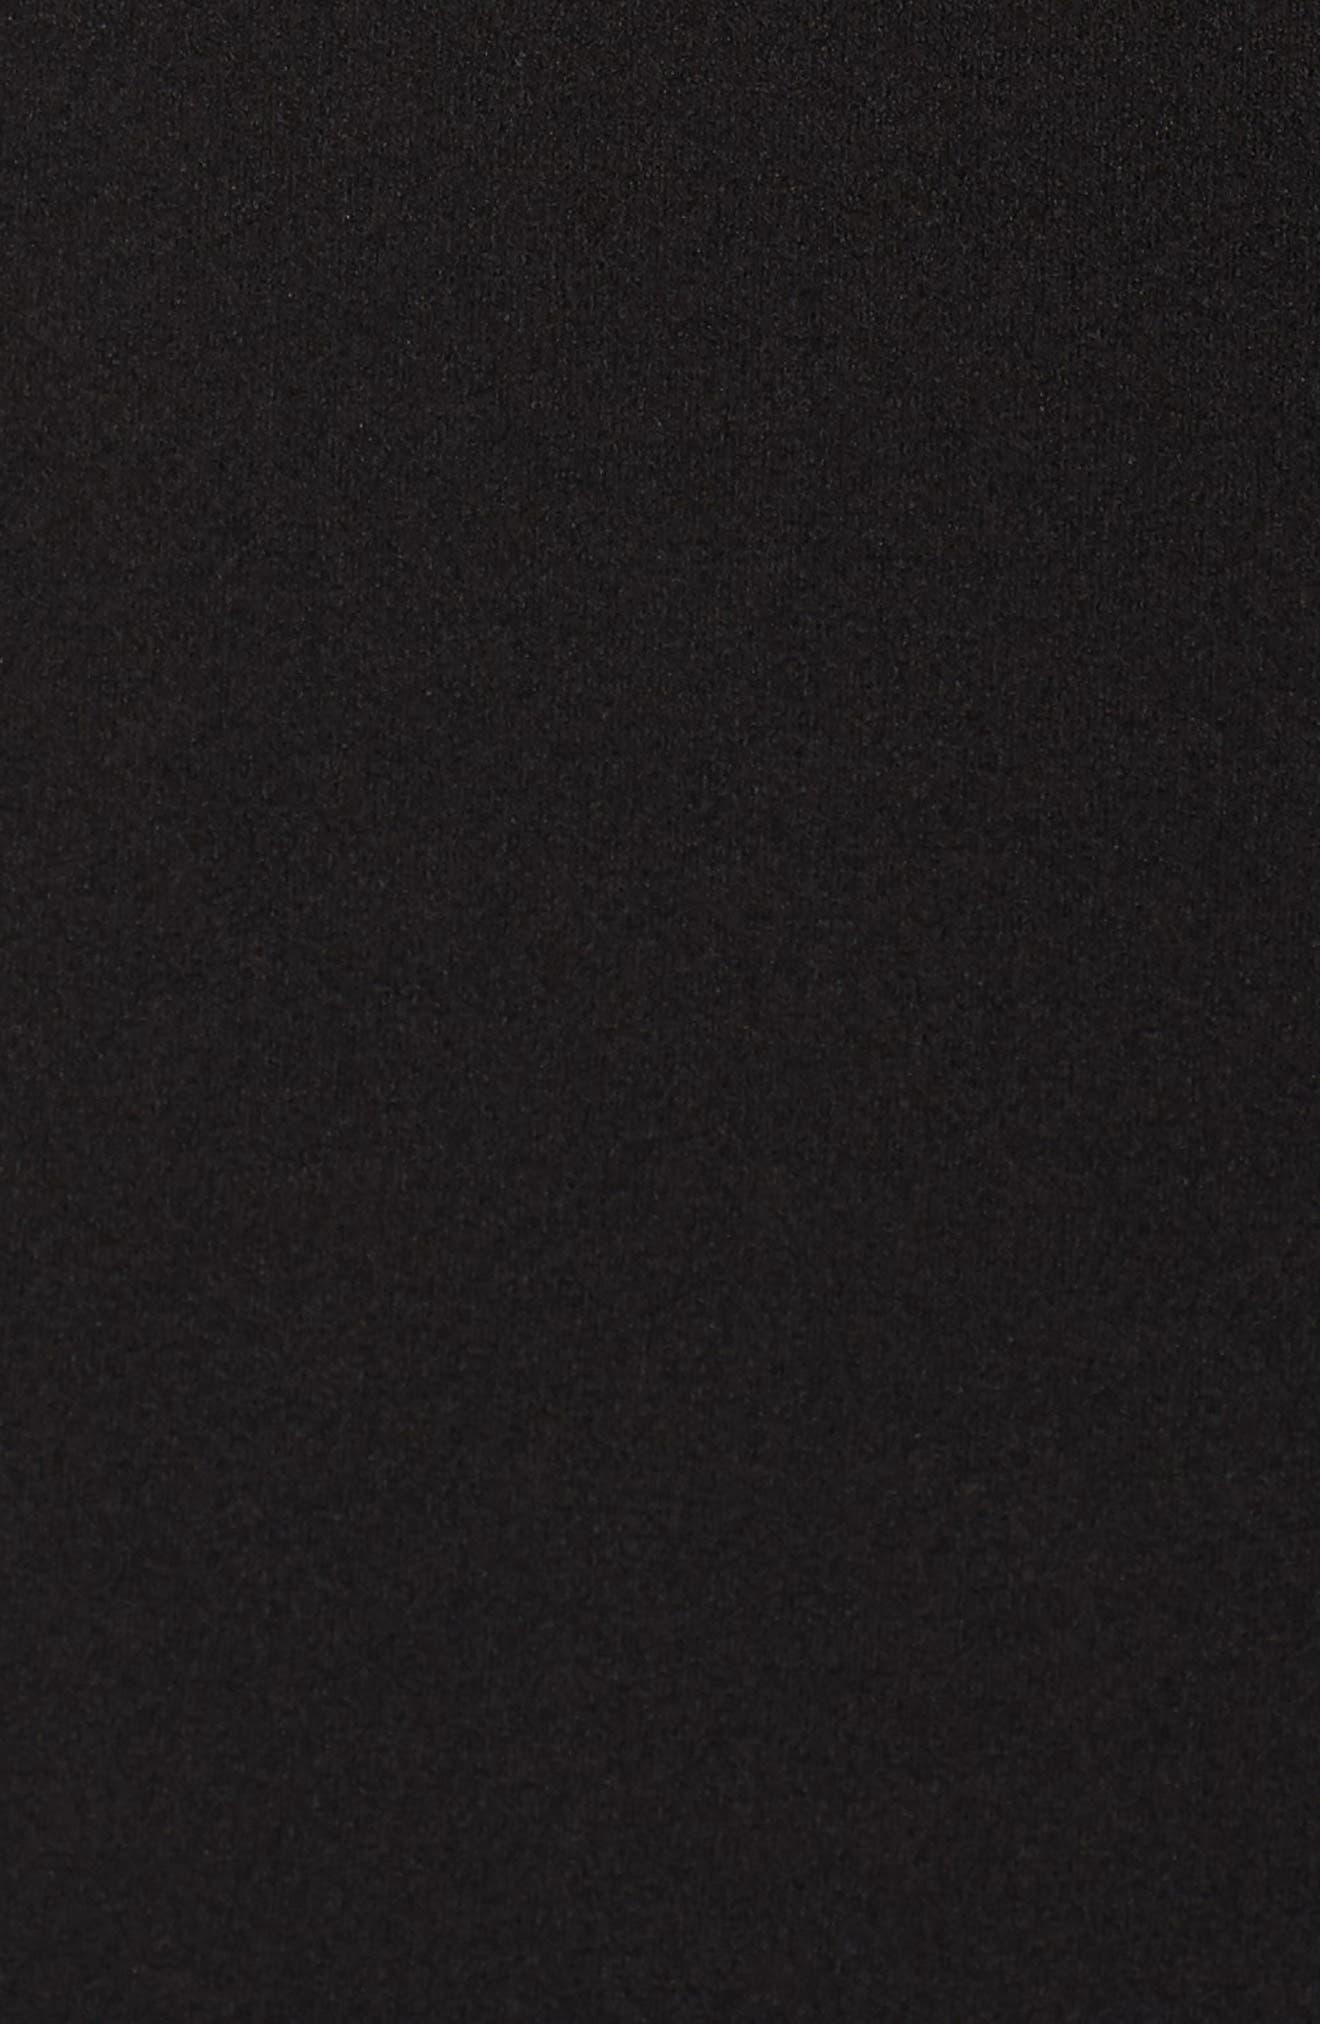 VINCE CAMUTO, Lace Panel Trumpet Gown, Alternate thumbnail 6, color, BLACK TAN